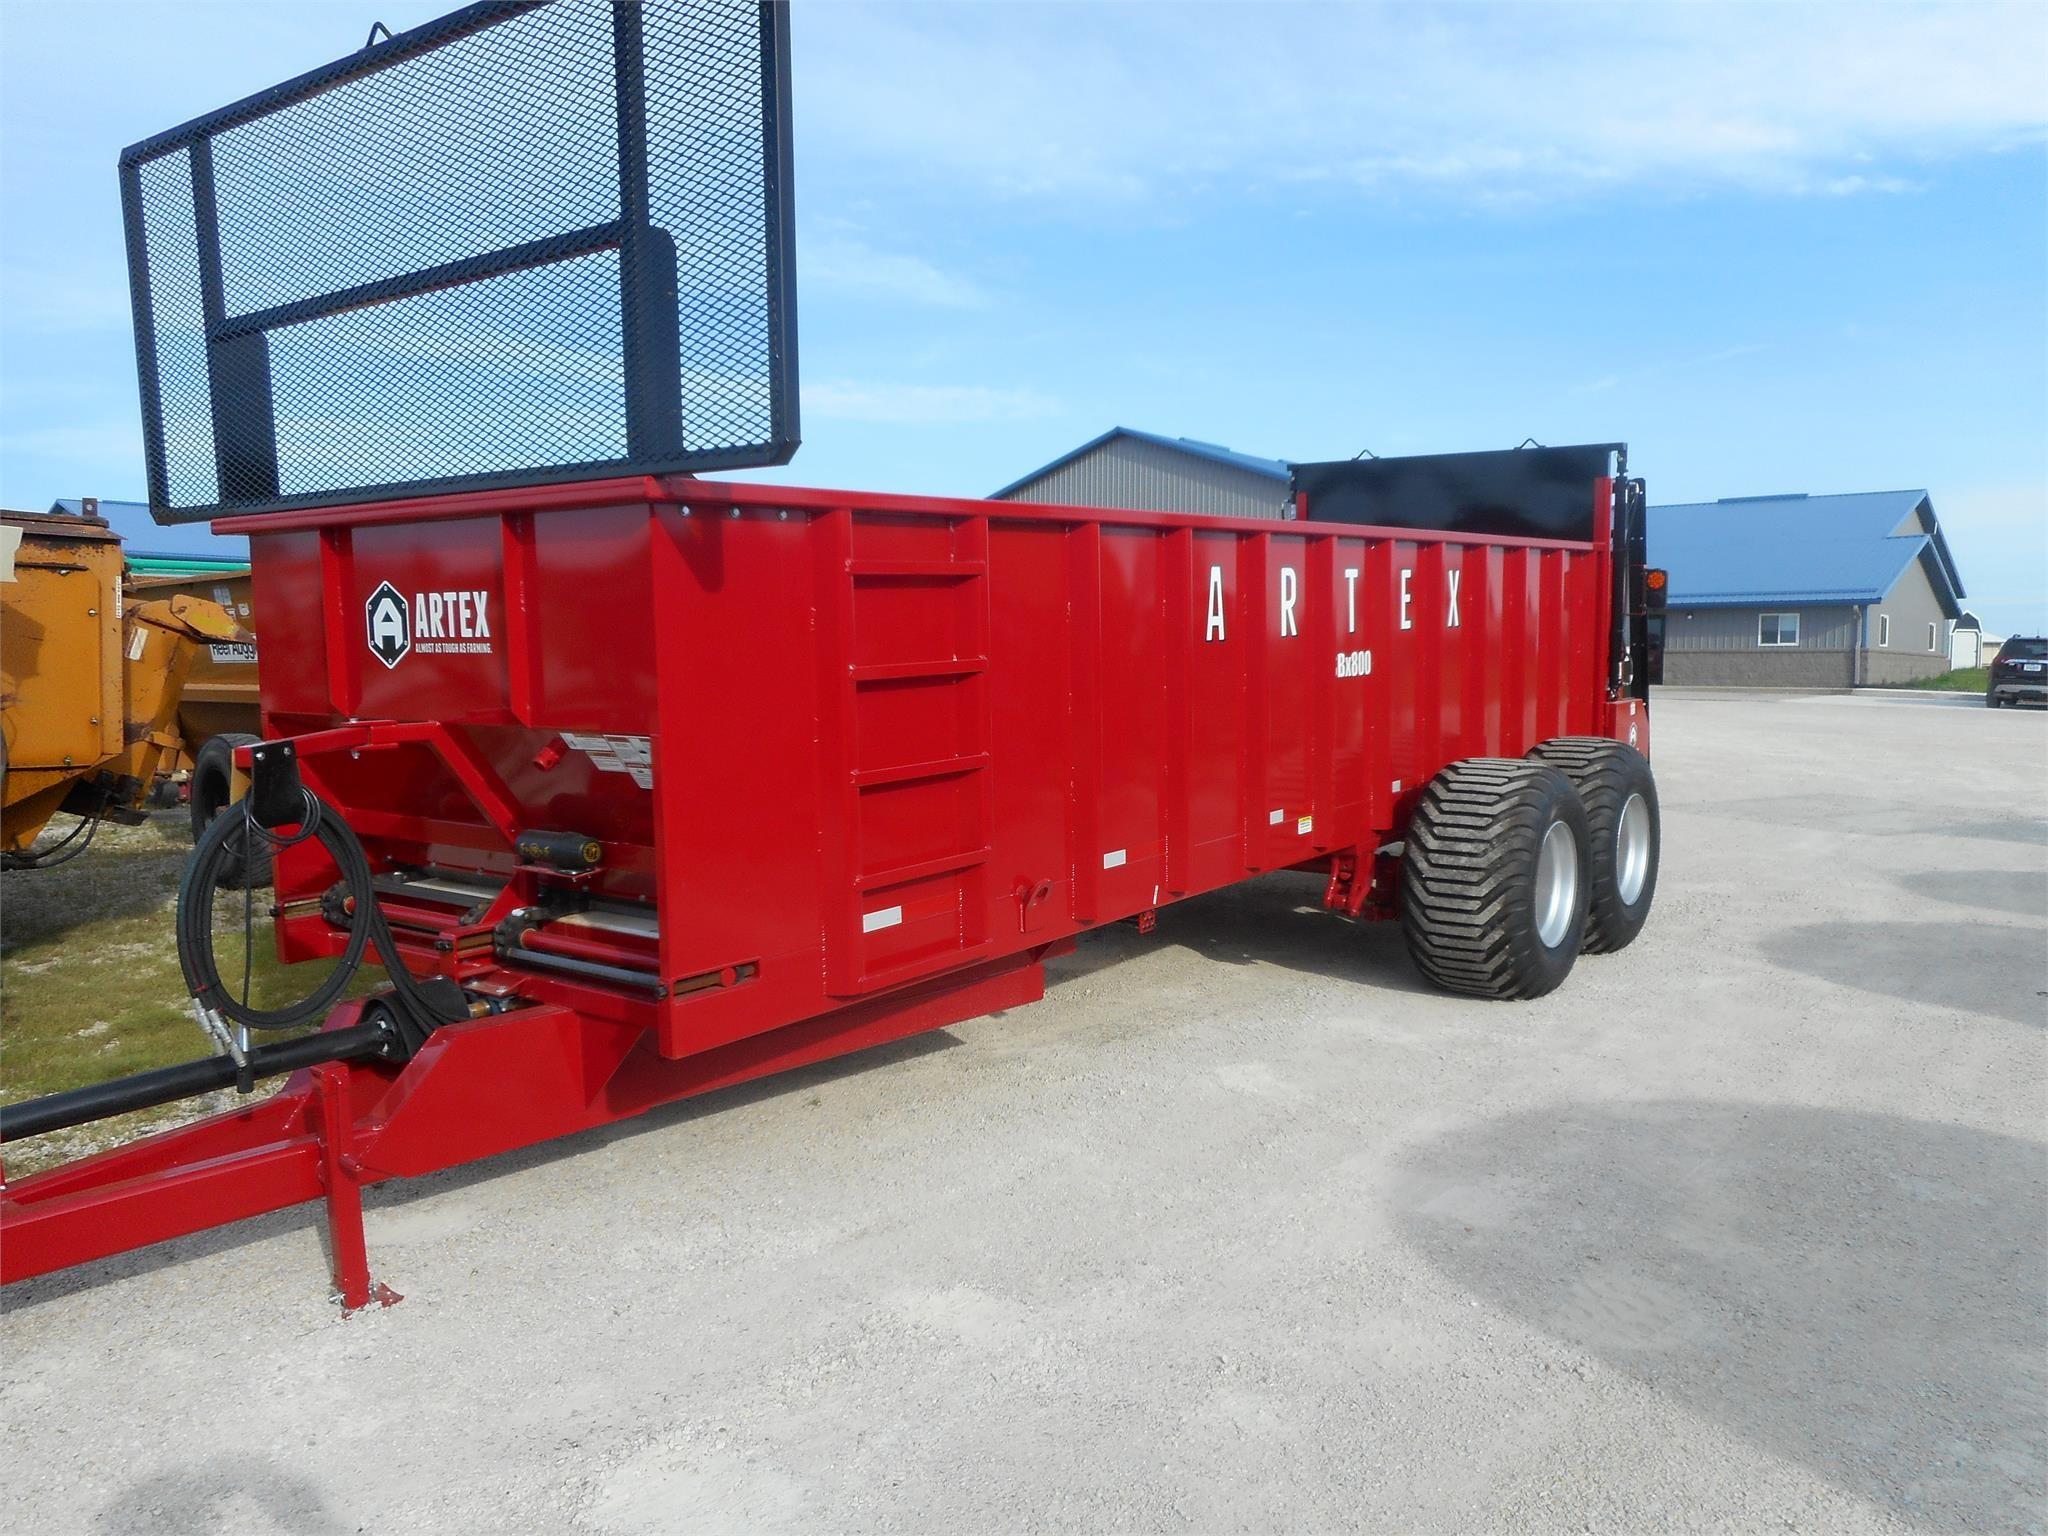 2020 Artex SBX800 Manure Spreader